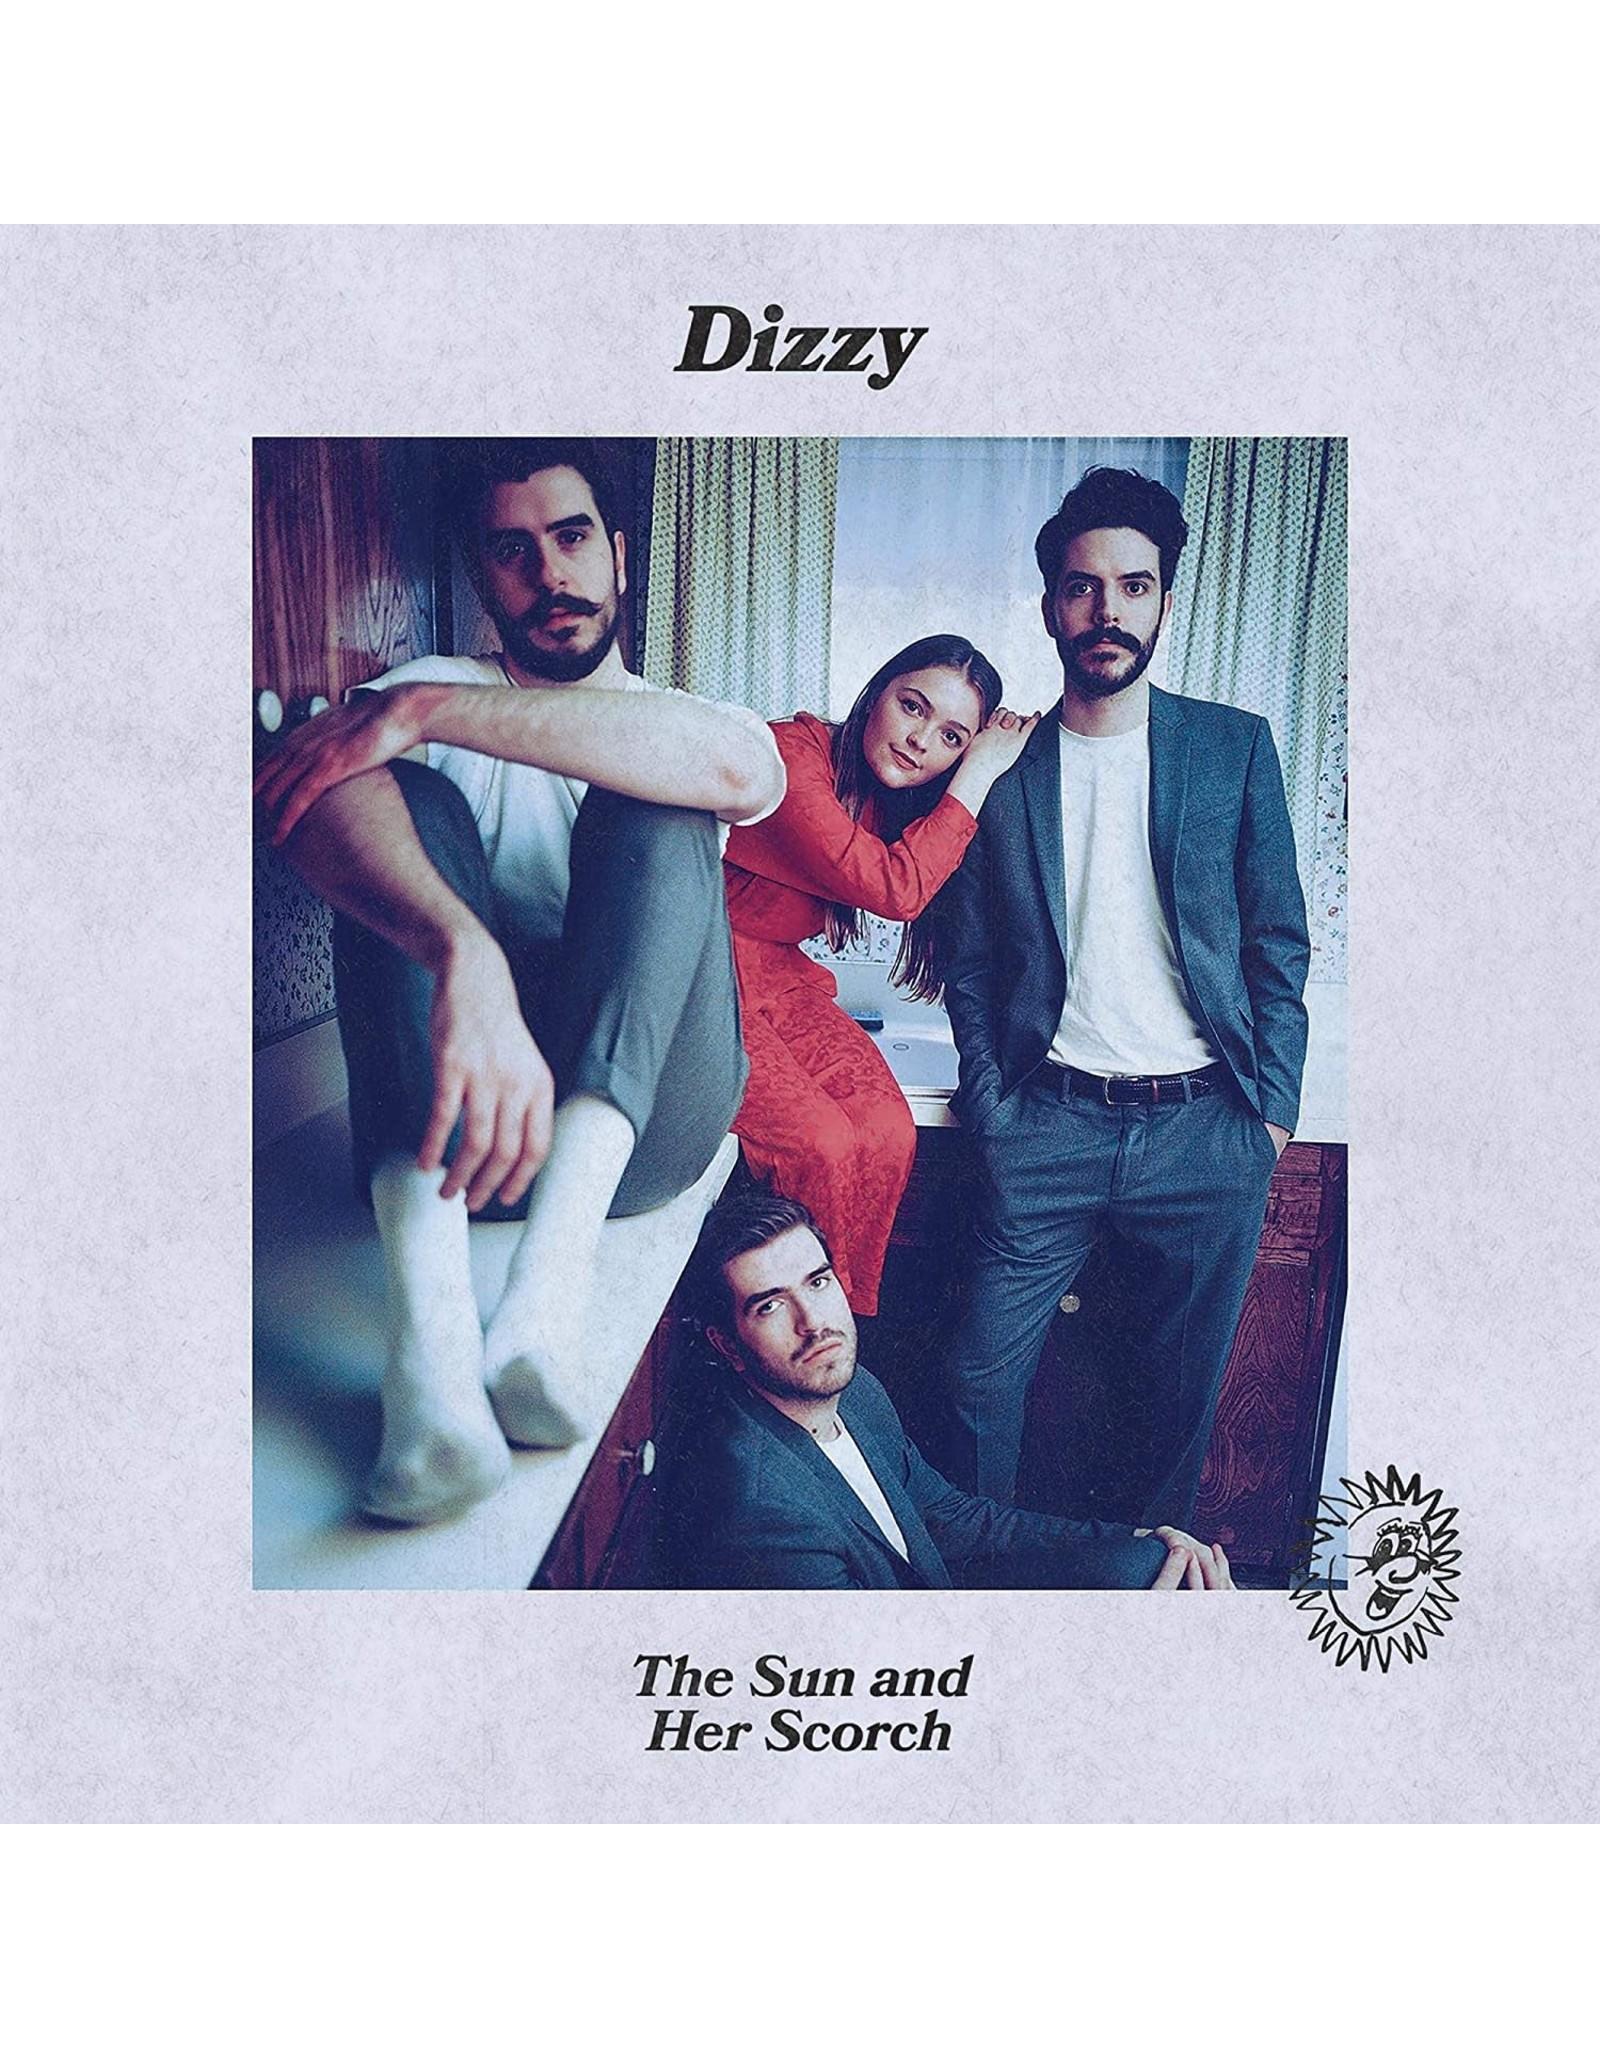 Dizzy - The Sun and Her Scorch (Coke Bottle Clear Vinyl)